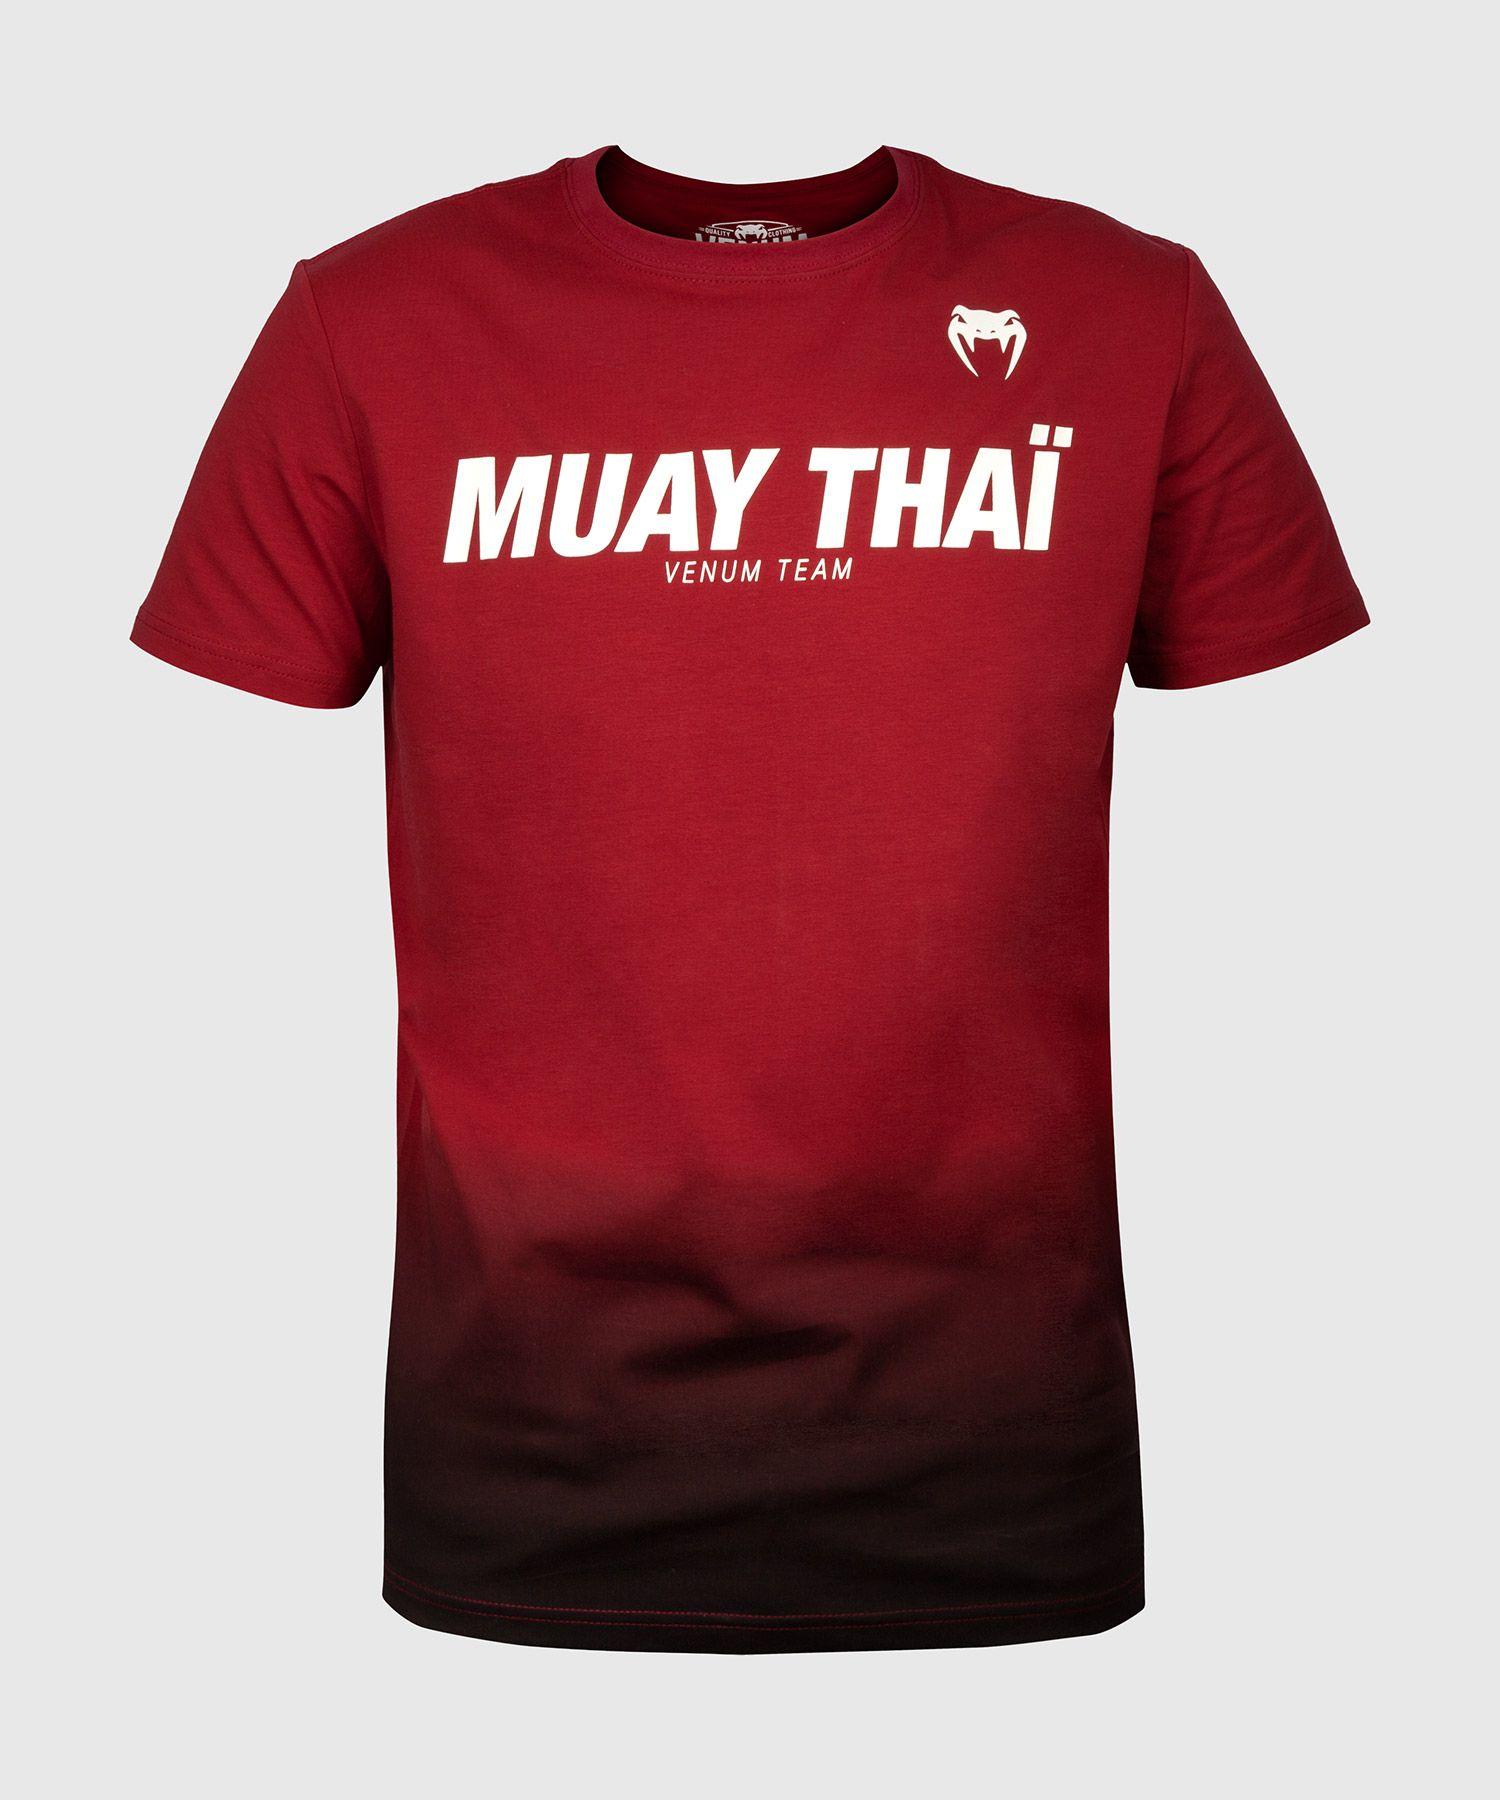 Venum Muay Thai VT T-shirt - Red Wine/Black